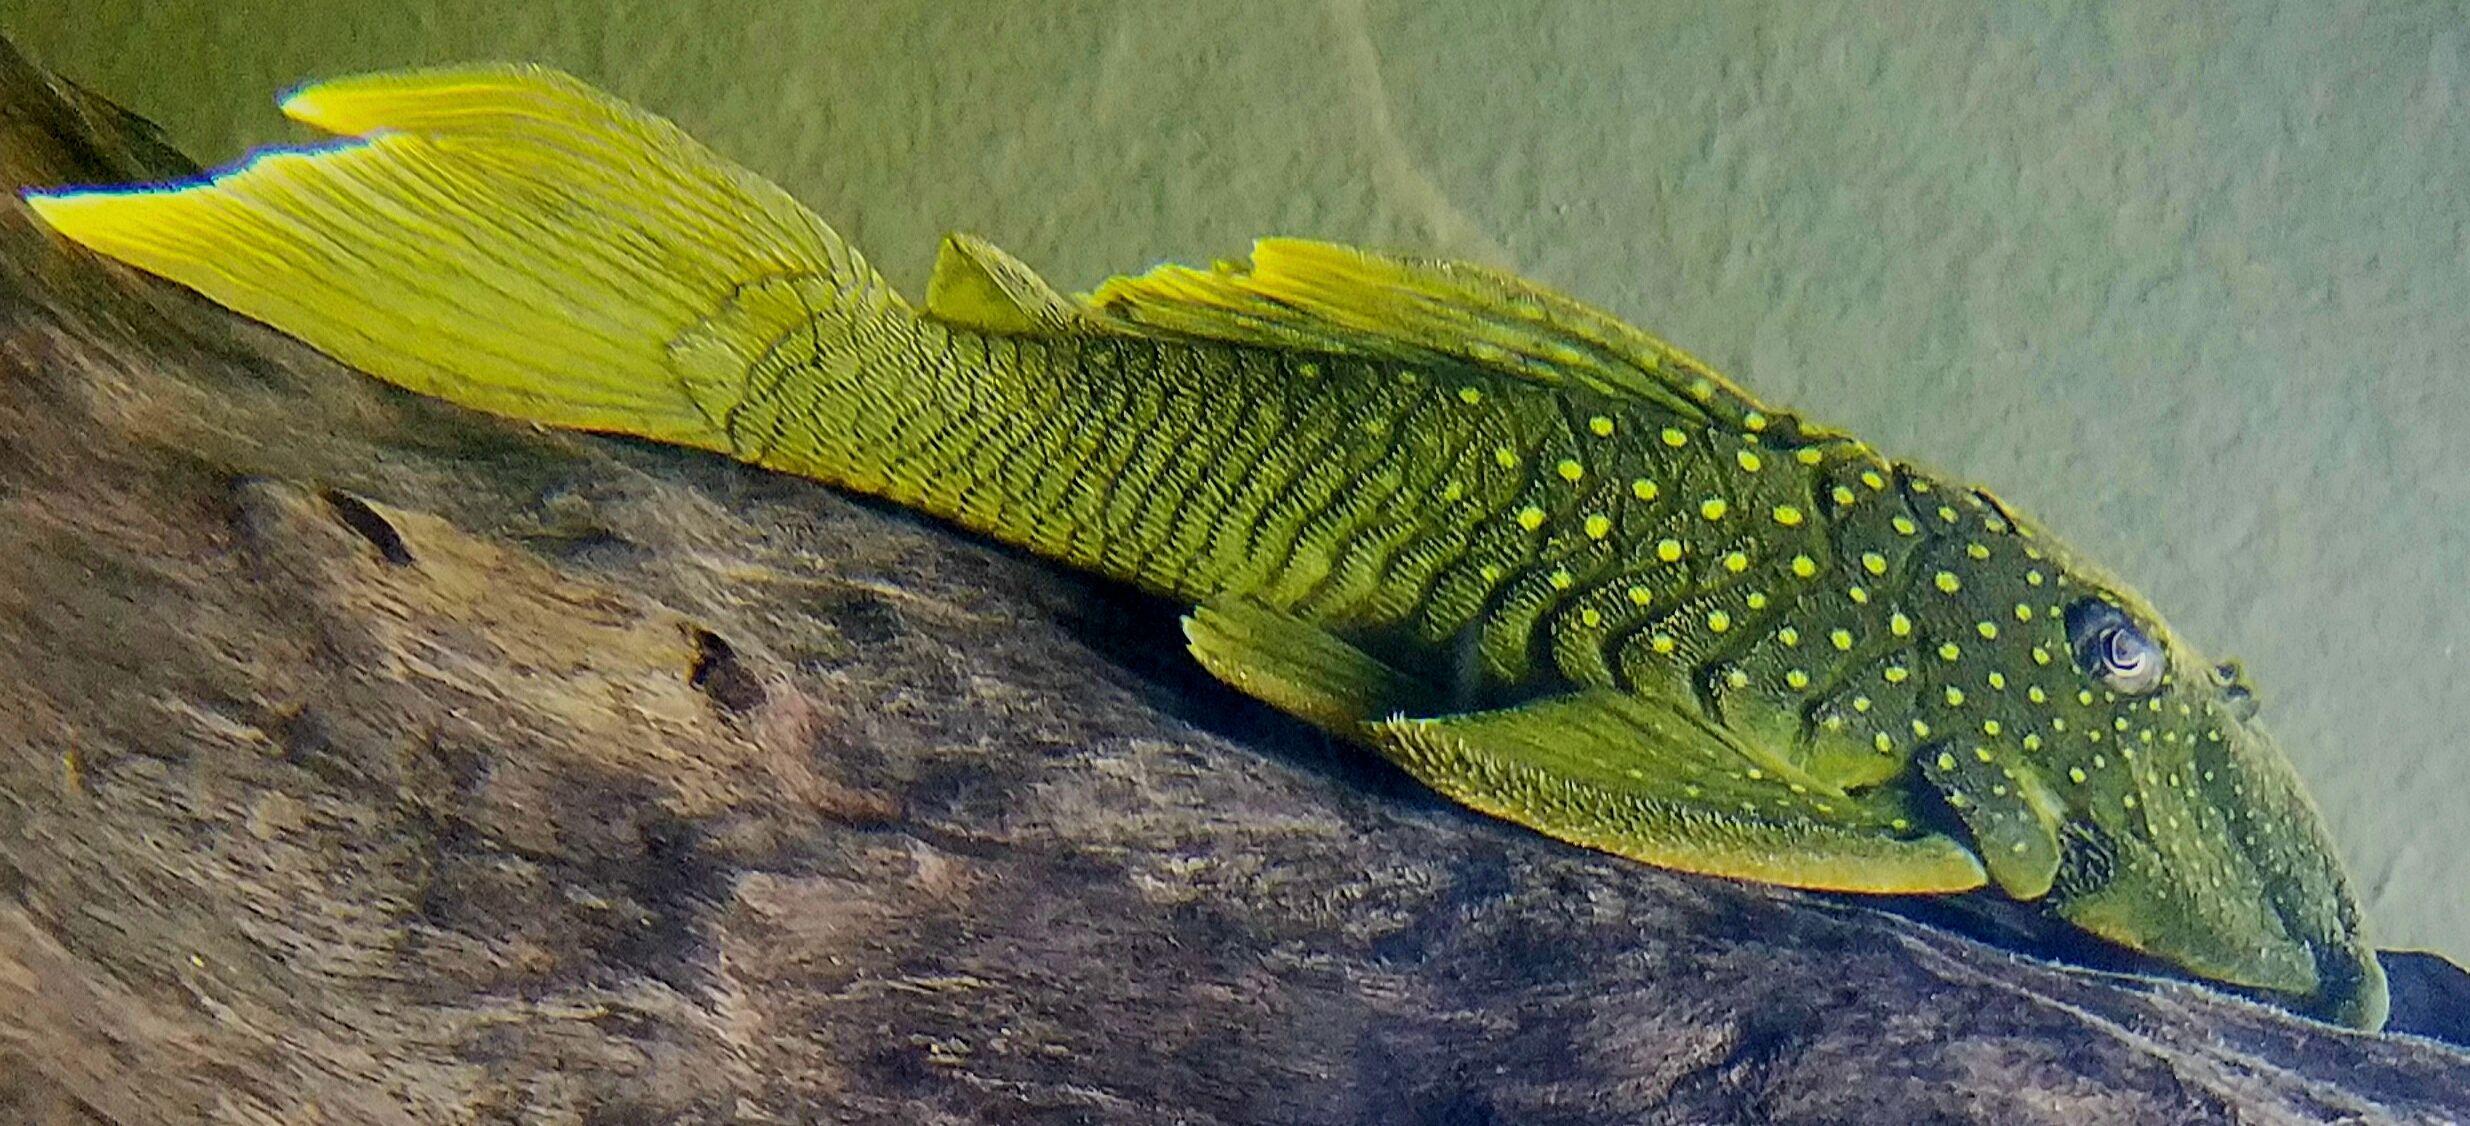 Green Phantom Pleco Hemiancistrus Subviridis L-200 | Anatomy: Water ...